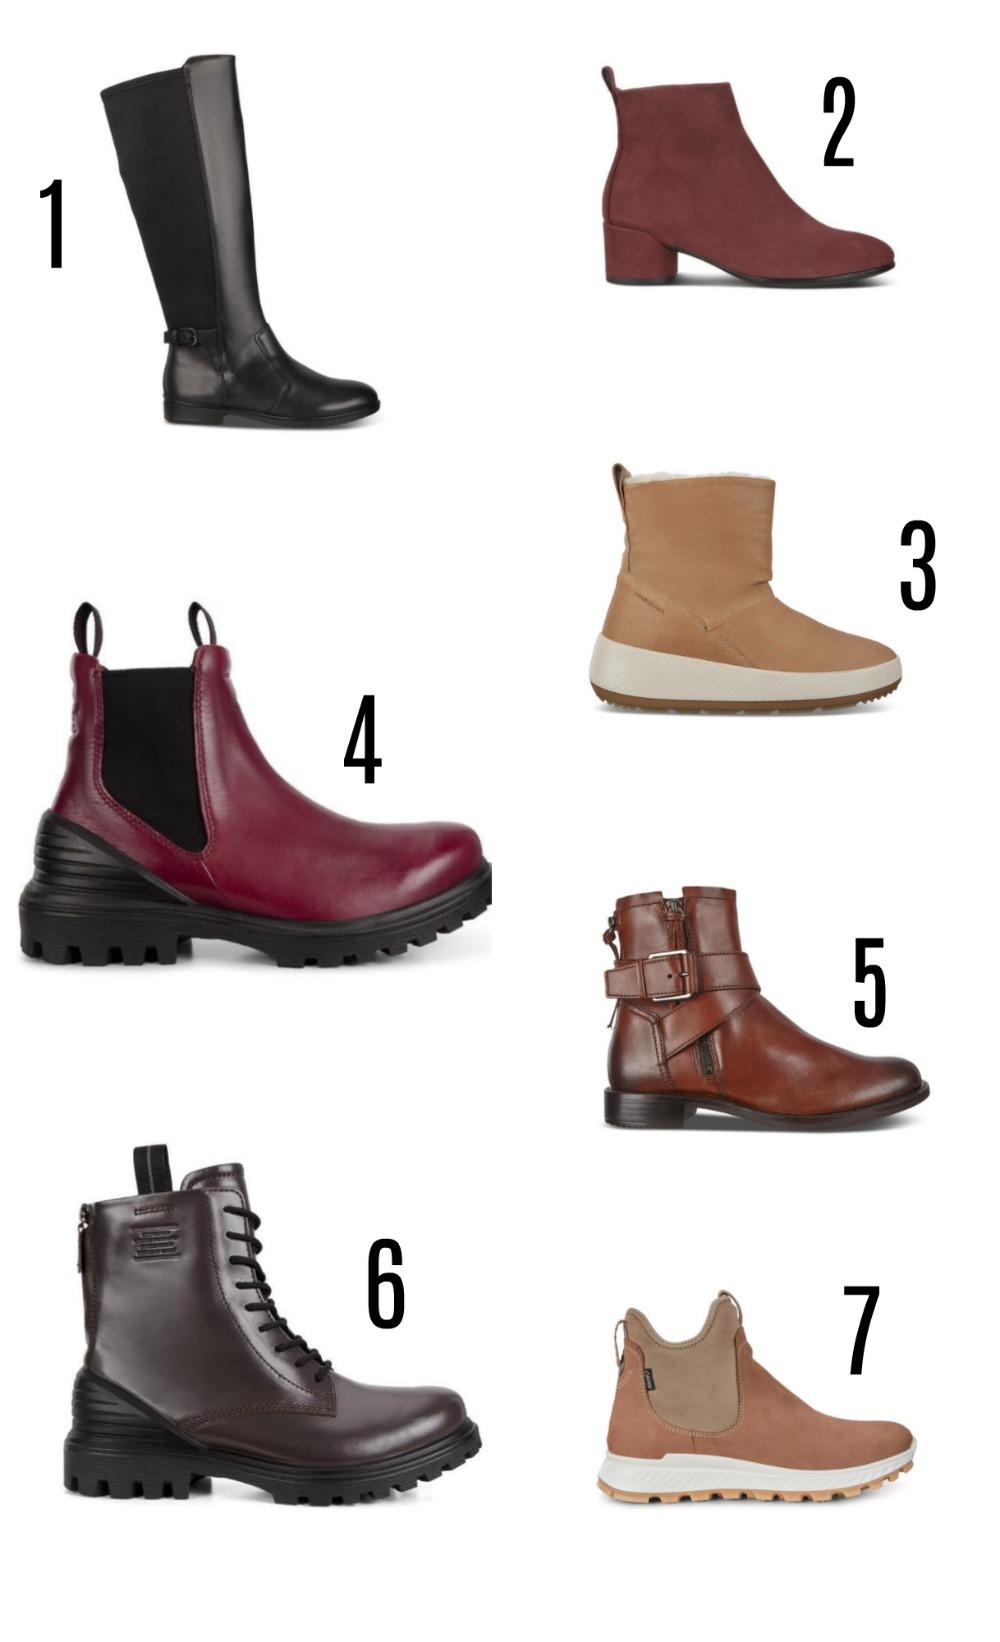 ECCO Fall 2020 Boots Lineup I DreaminLace.com #fallfashion #boots